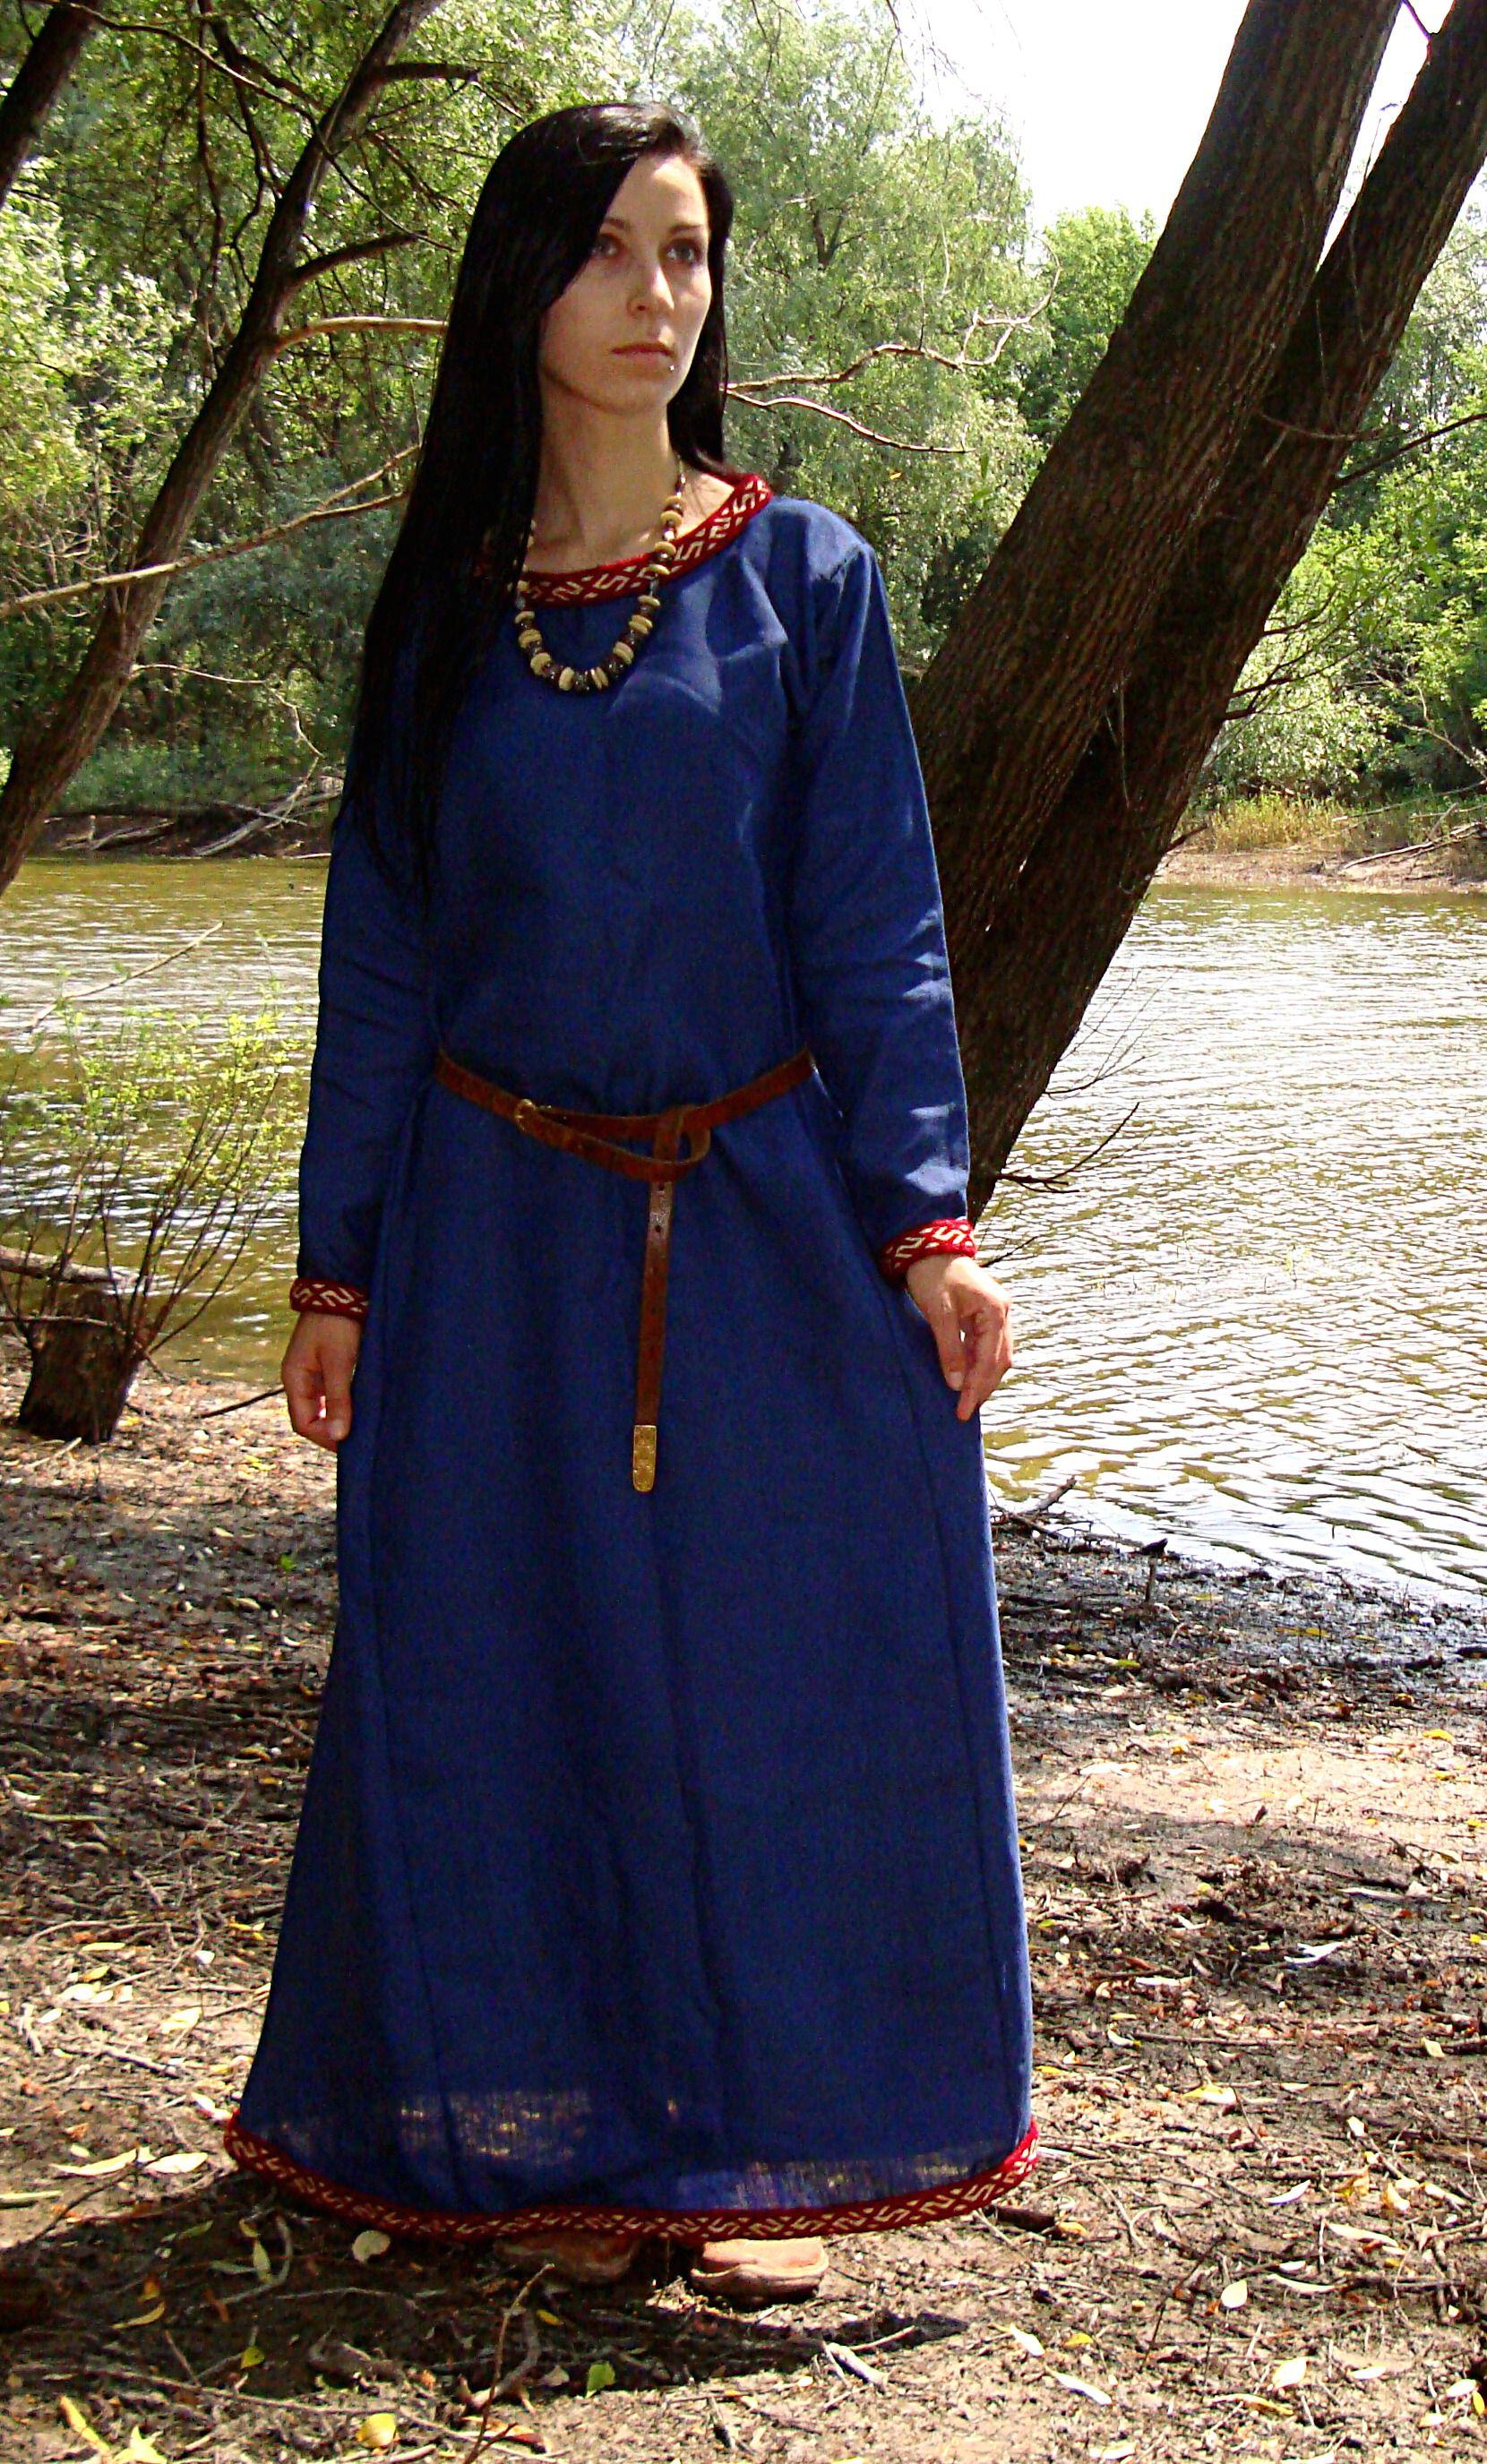 Early medieval underdress mede of linen Dresses, Viking